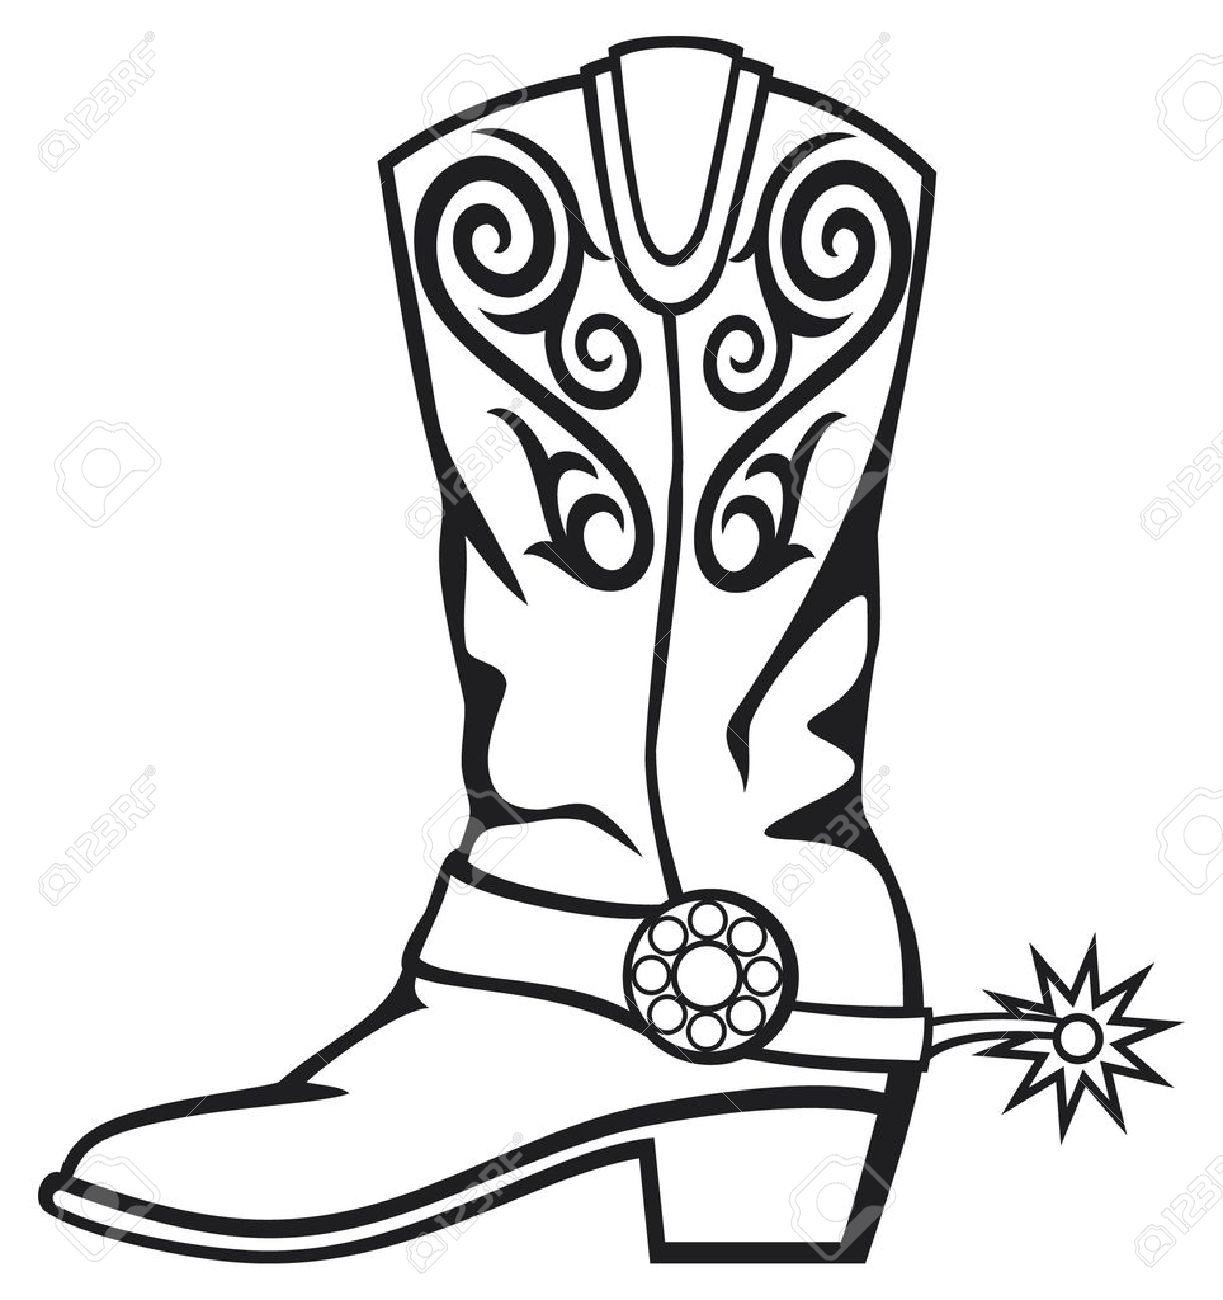 Cowboy boots images clip art.